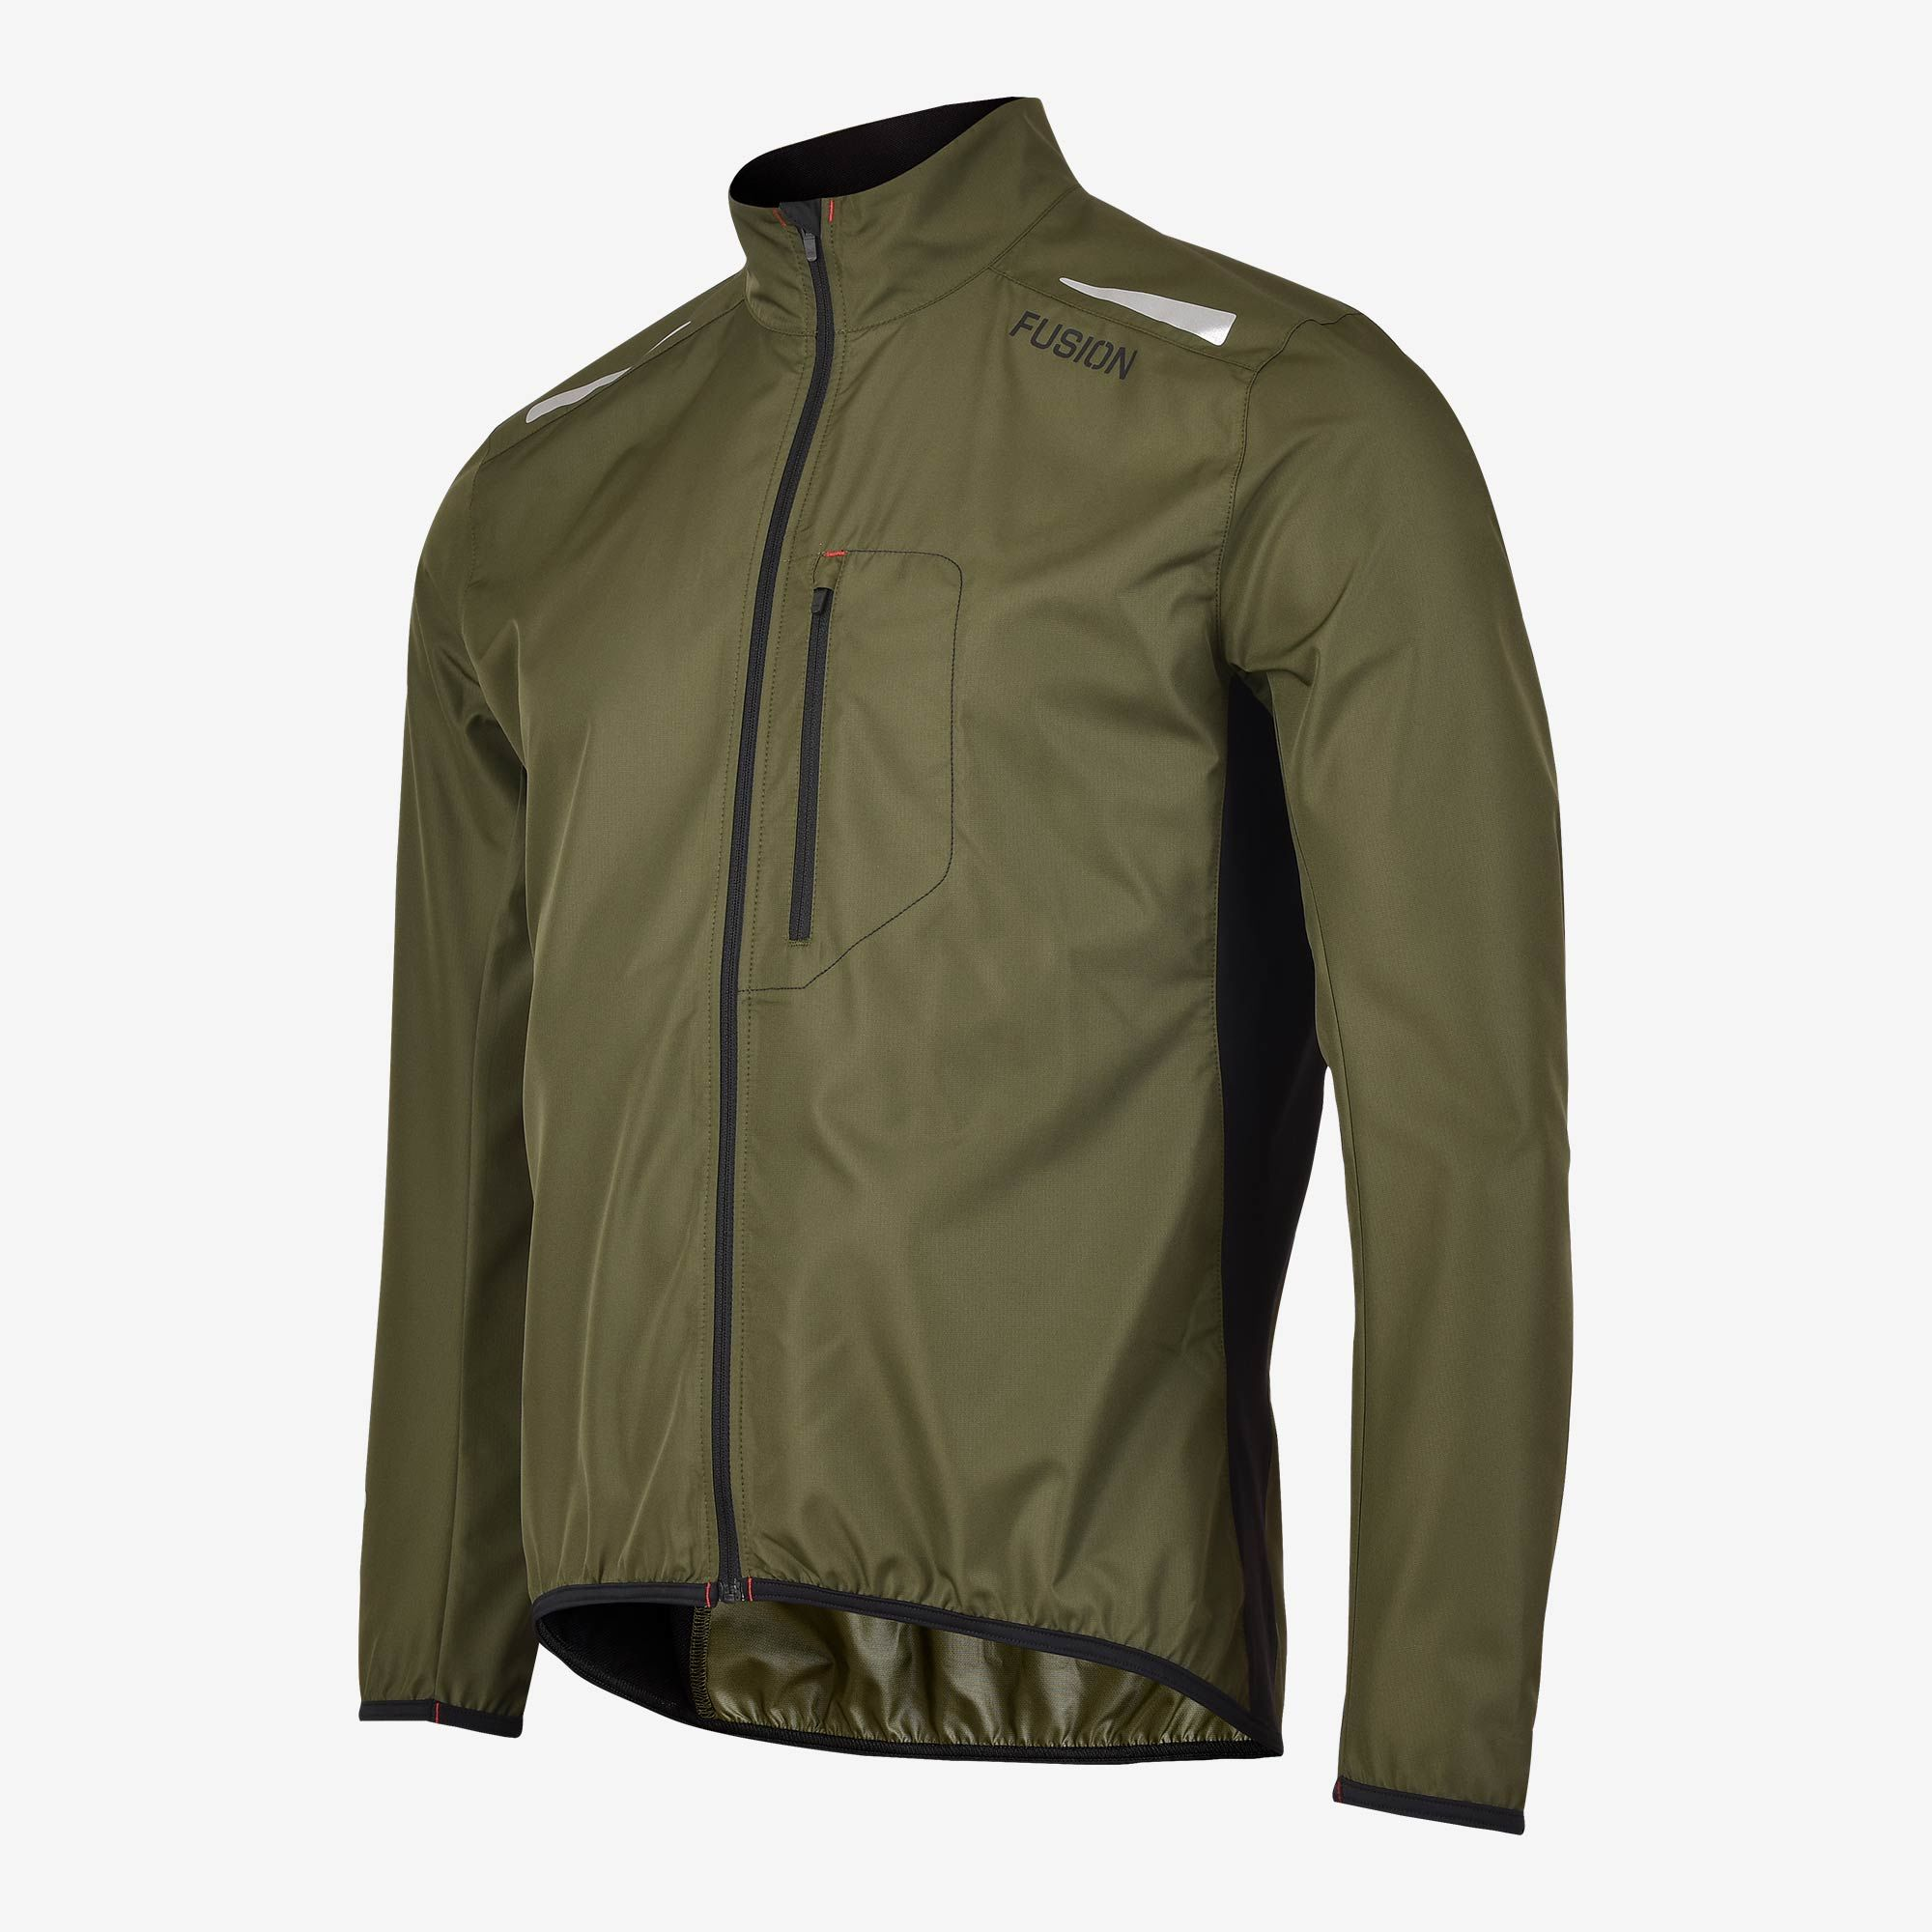 Fusion S1 Run Jacket (Green)